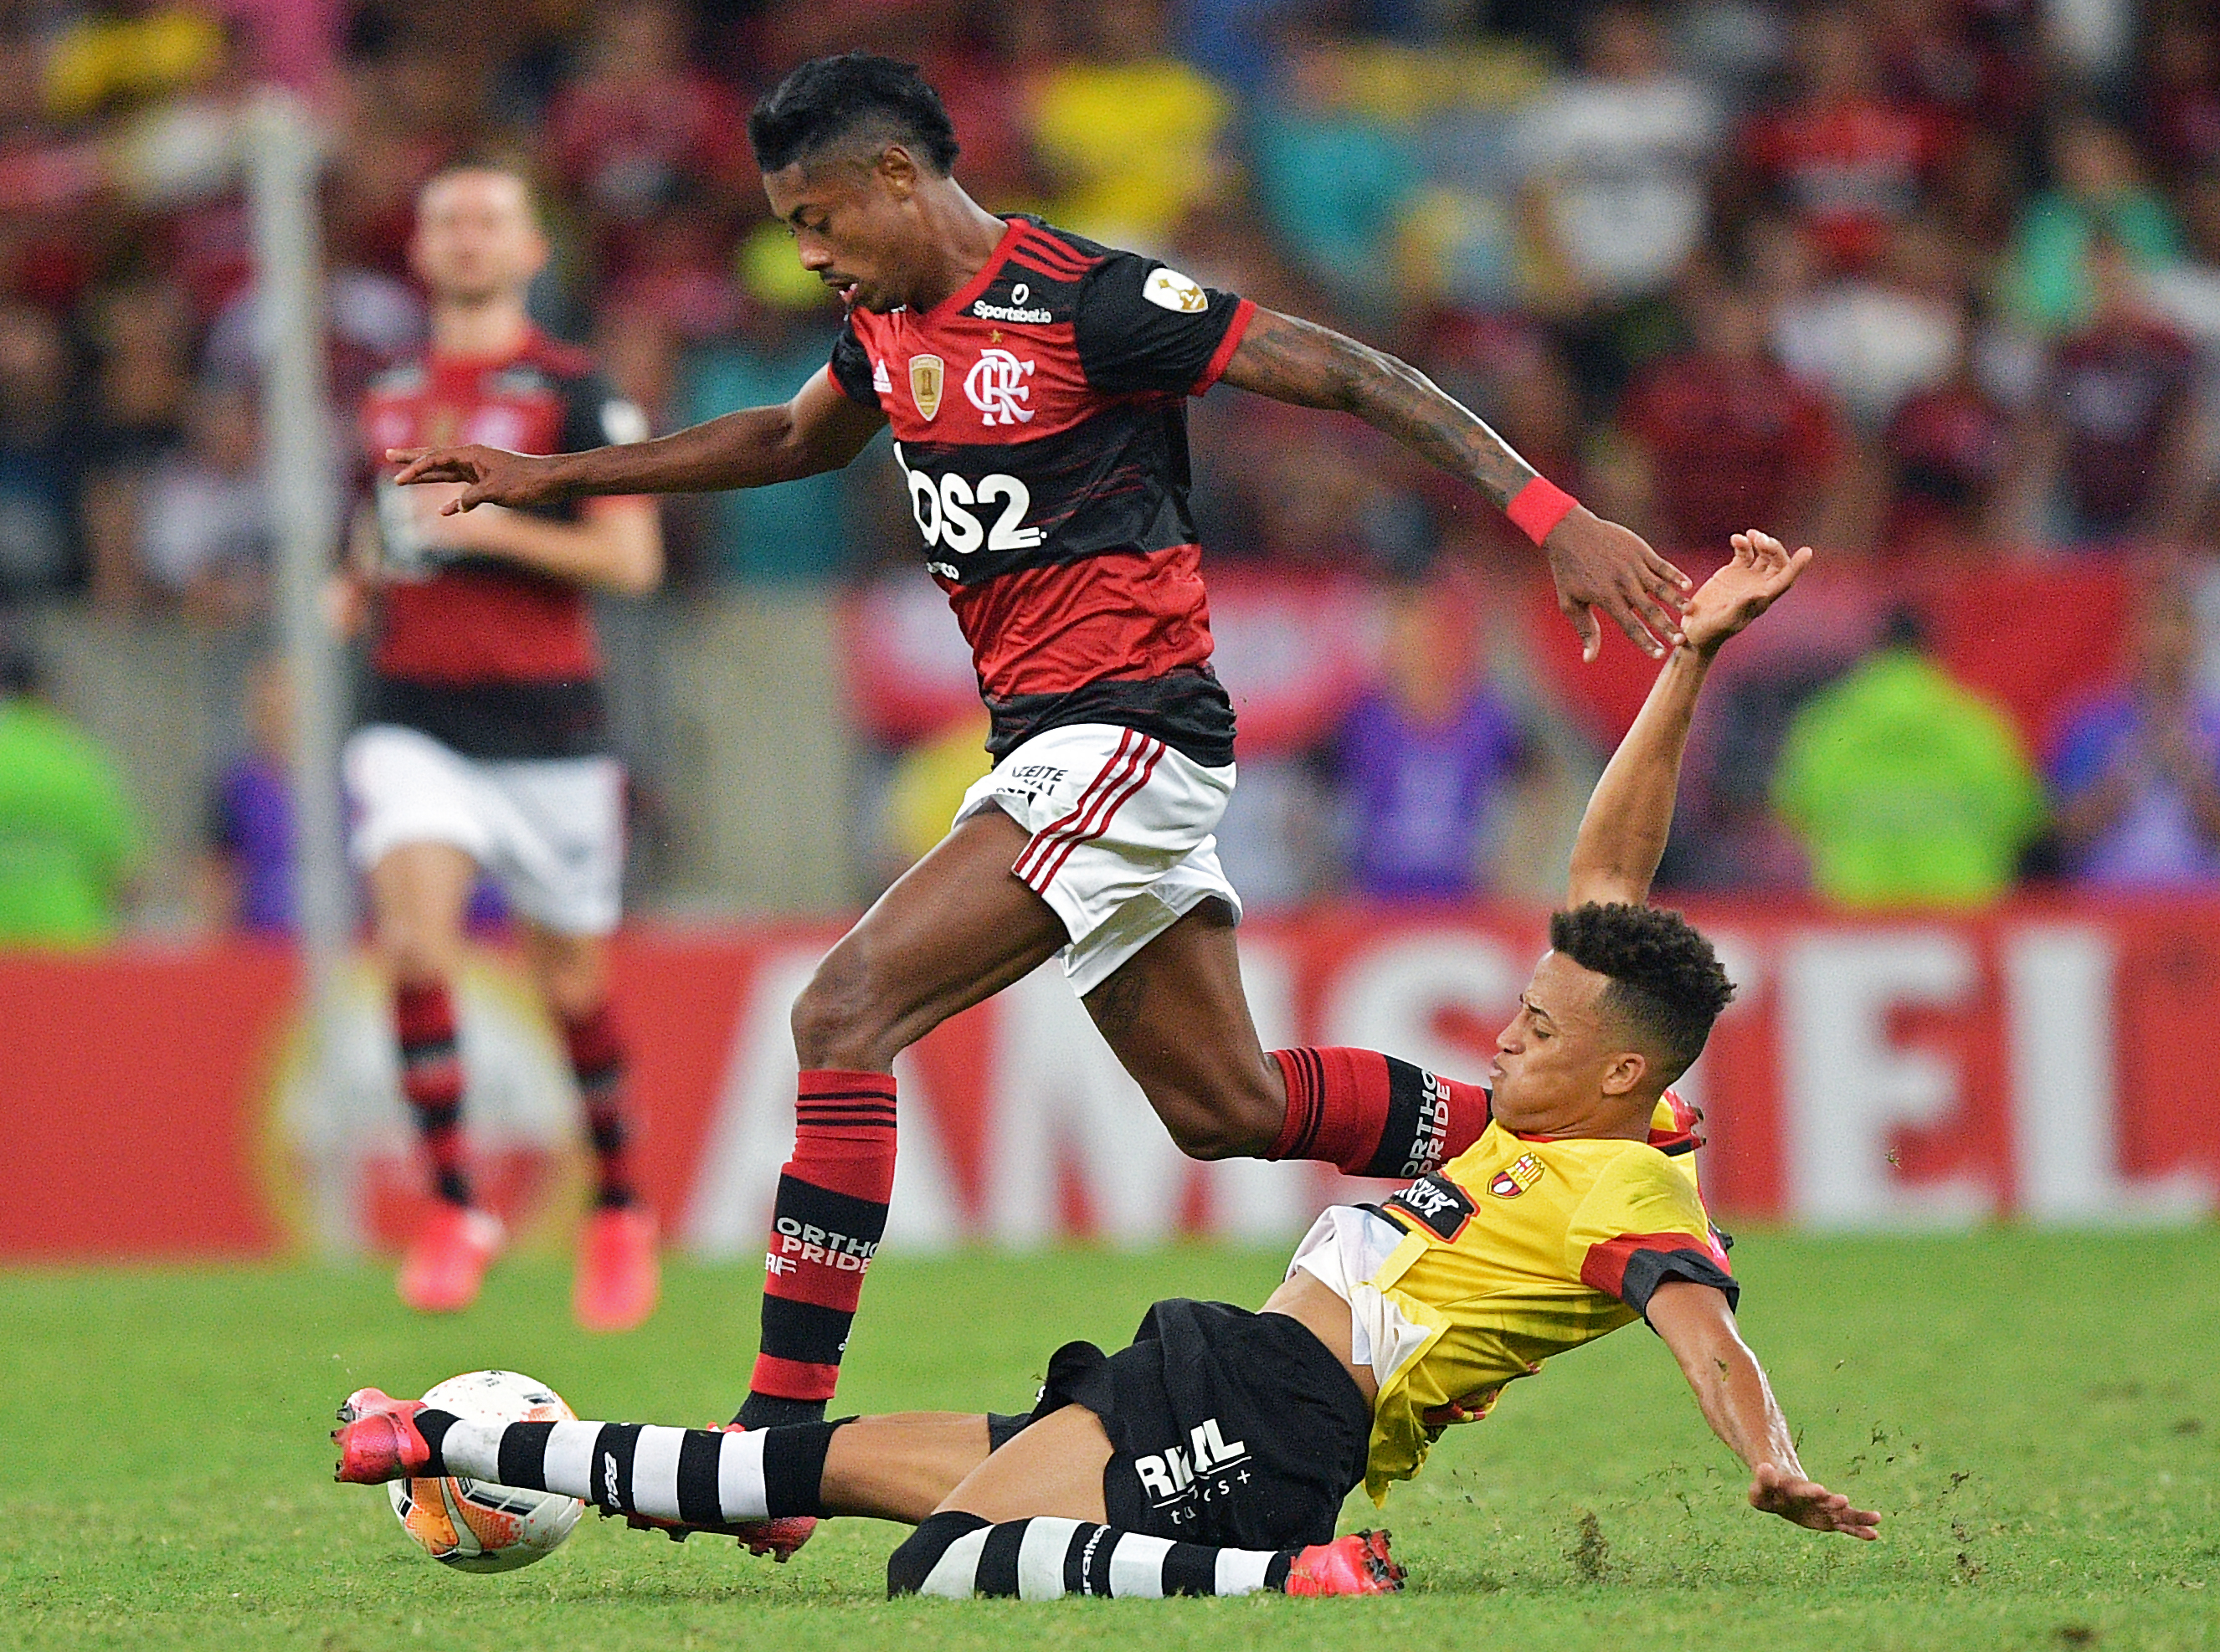 Flamengo - Barcelona SC